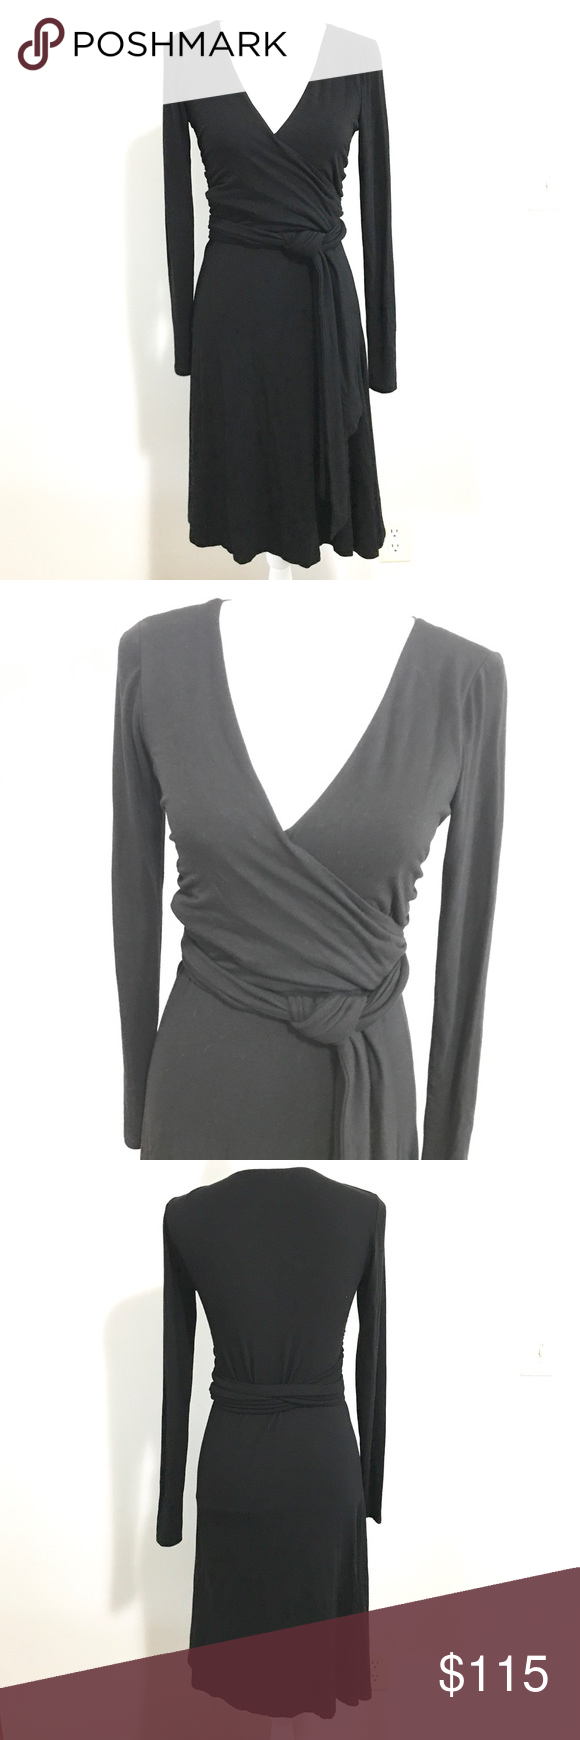 Ralph lauren vneck long sleeve black wrap dress wrap dresses and flaws